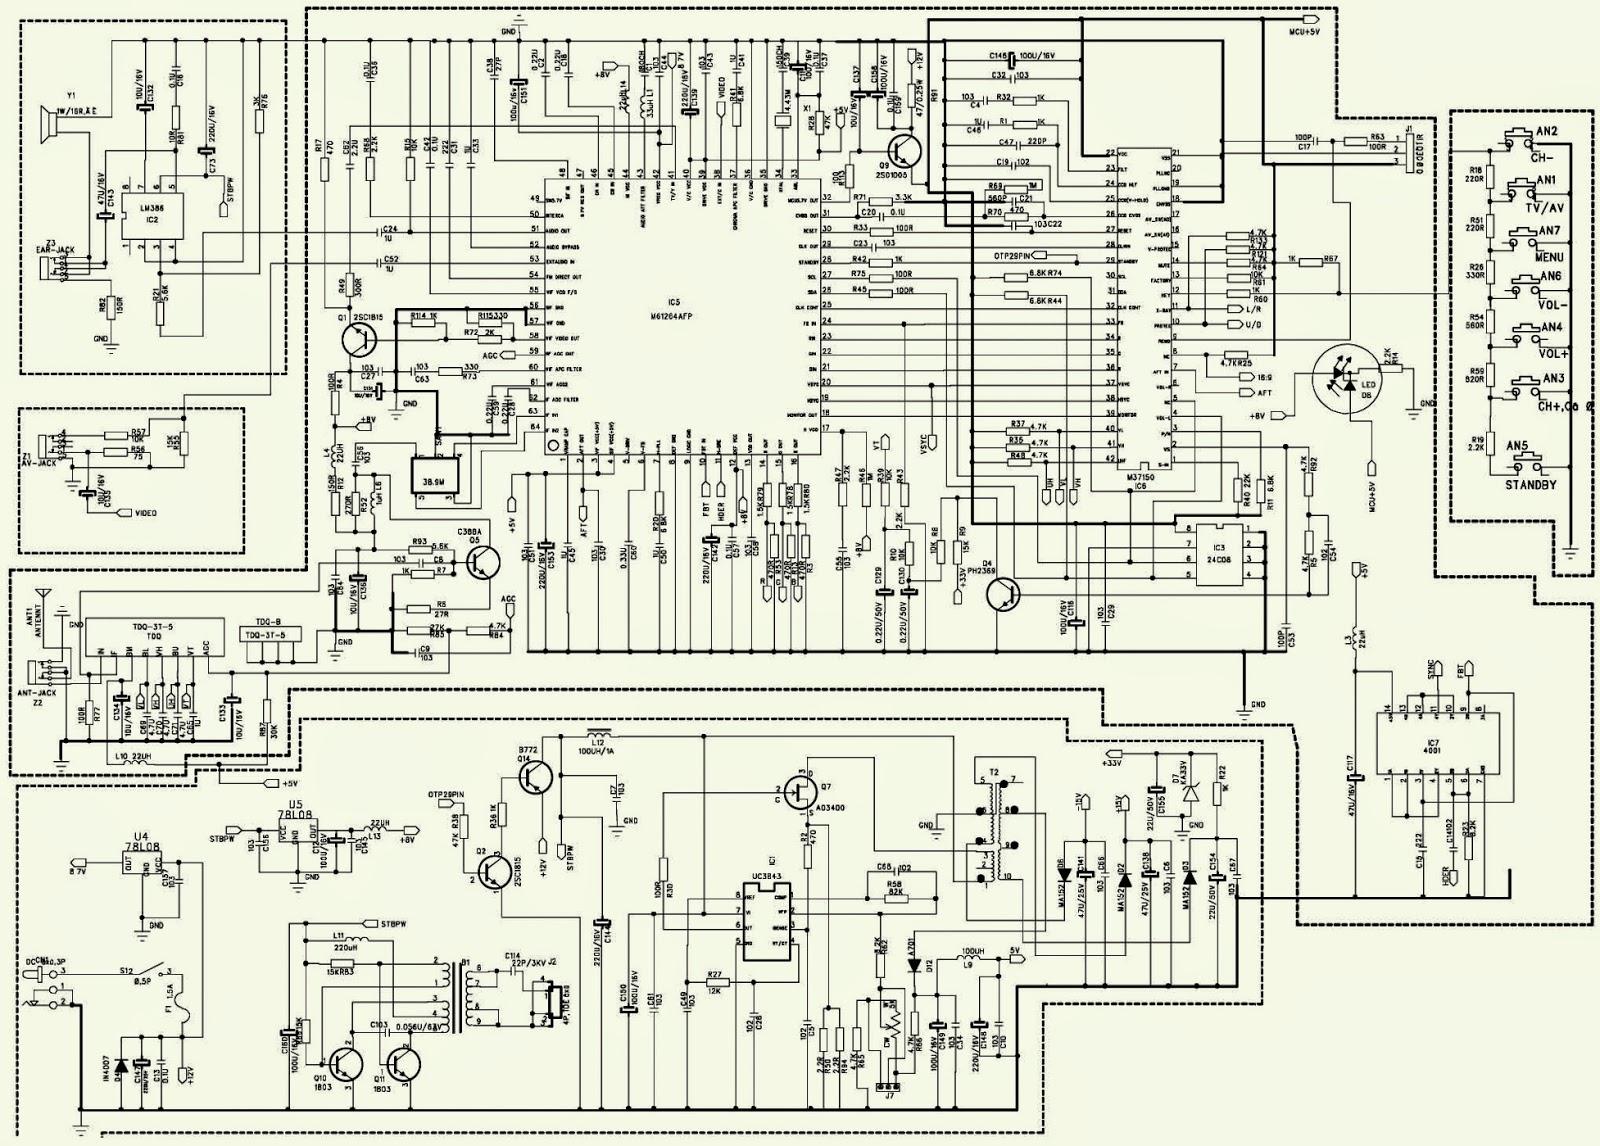 hyundai tv 800 7 inch tft lcd tv schematic circuit diagram  [ 1600 x 1146 Pixel ]